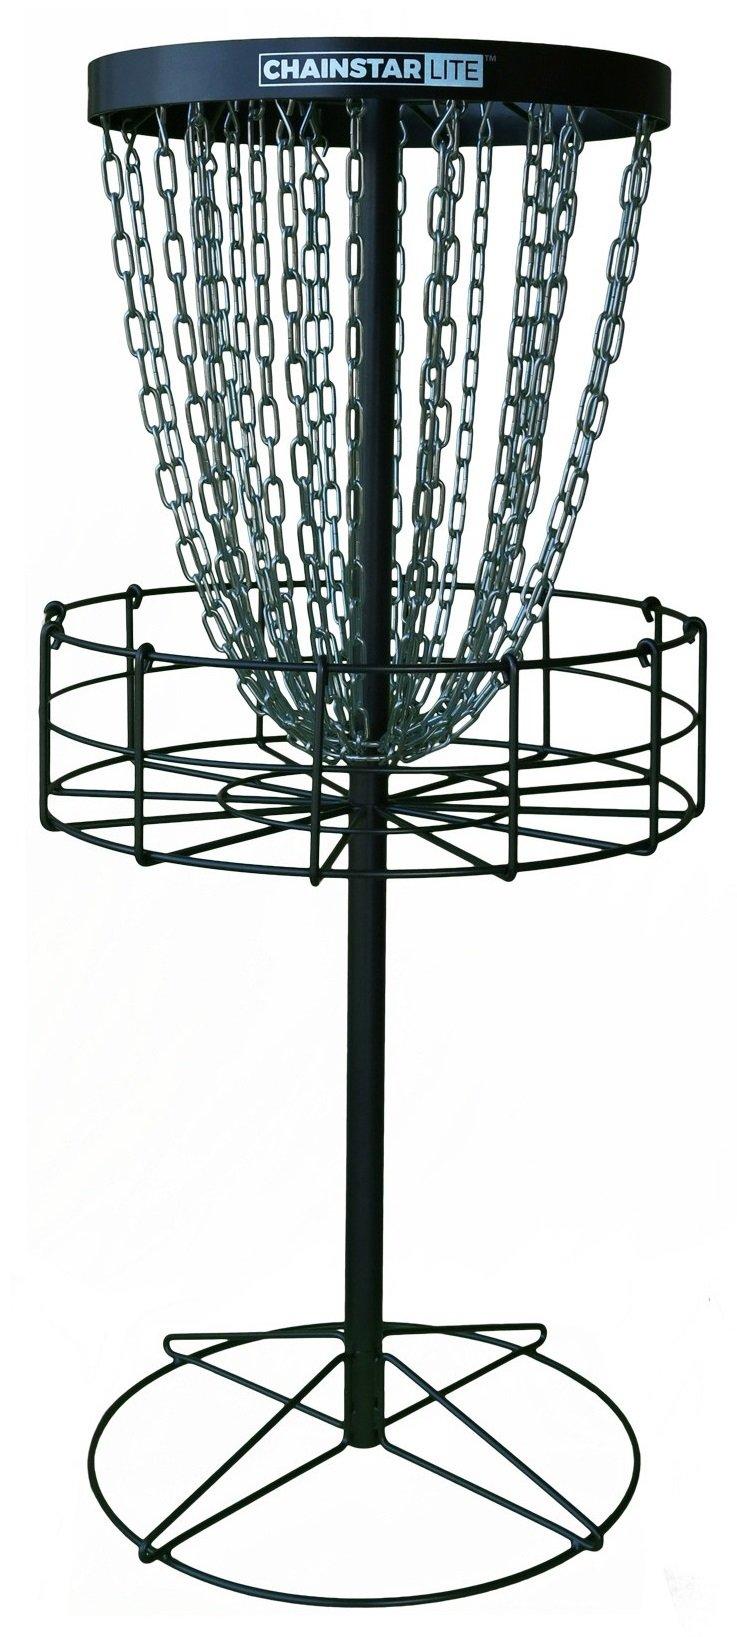 Discraft Chainstar LITE 24-Chain Disc Golf Basket - Silver by Discraft